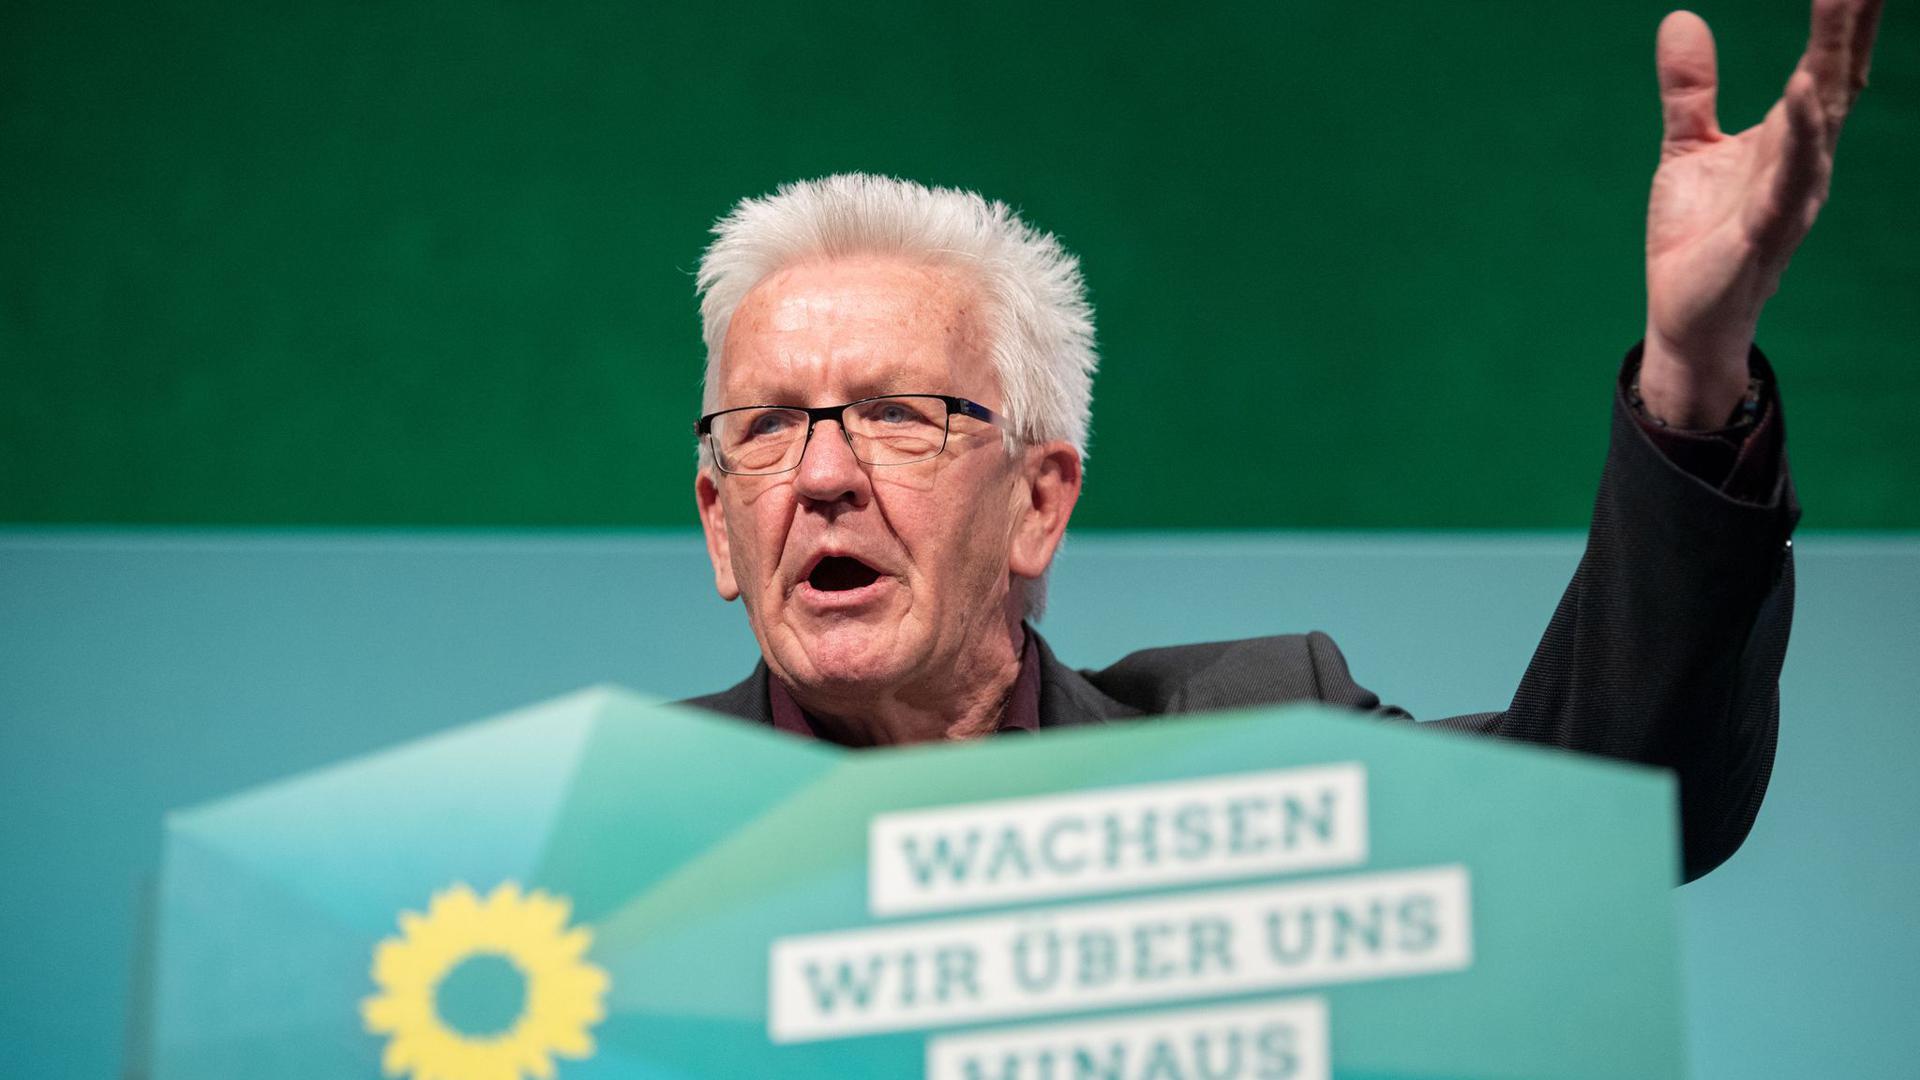 Baden-Württembergs Ministerpräsident Kretschmann (Grüne) bei der Landesdelegiertenkonferenz.